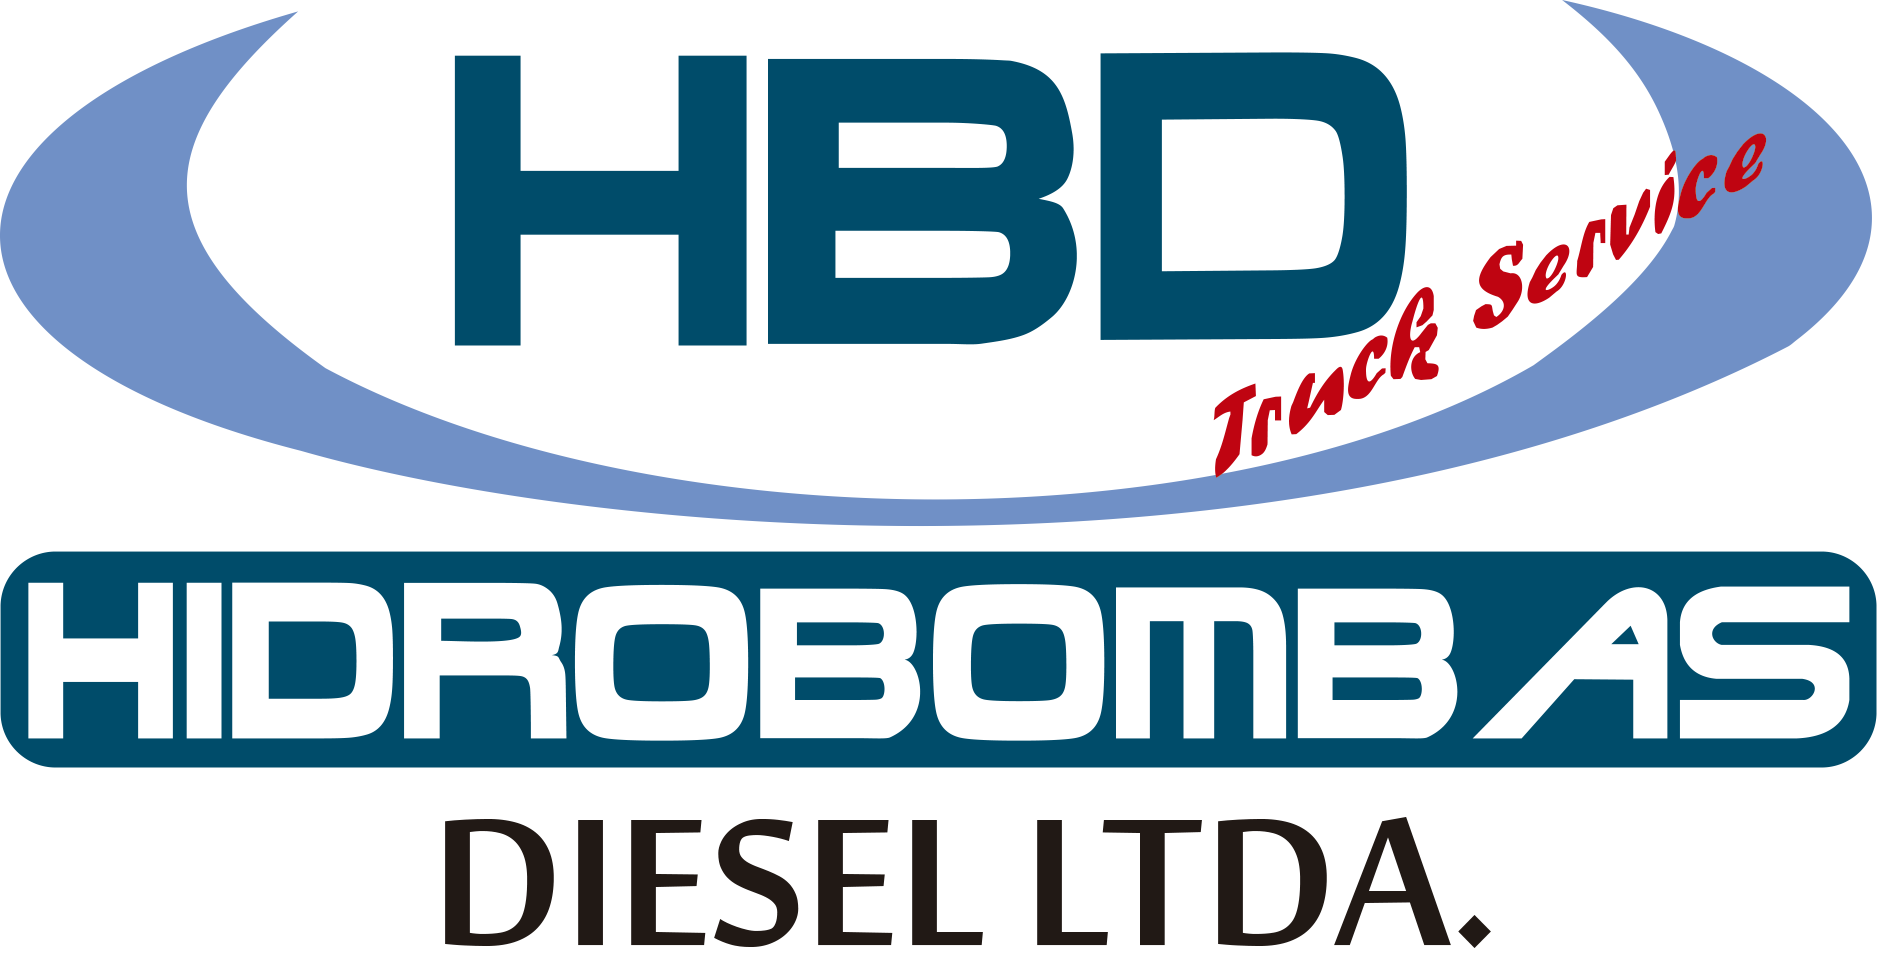 Hidrobombas Diesel Ltda